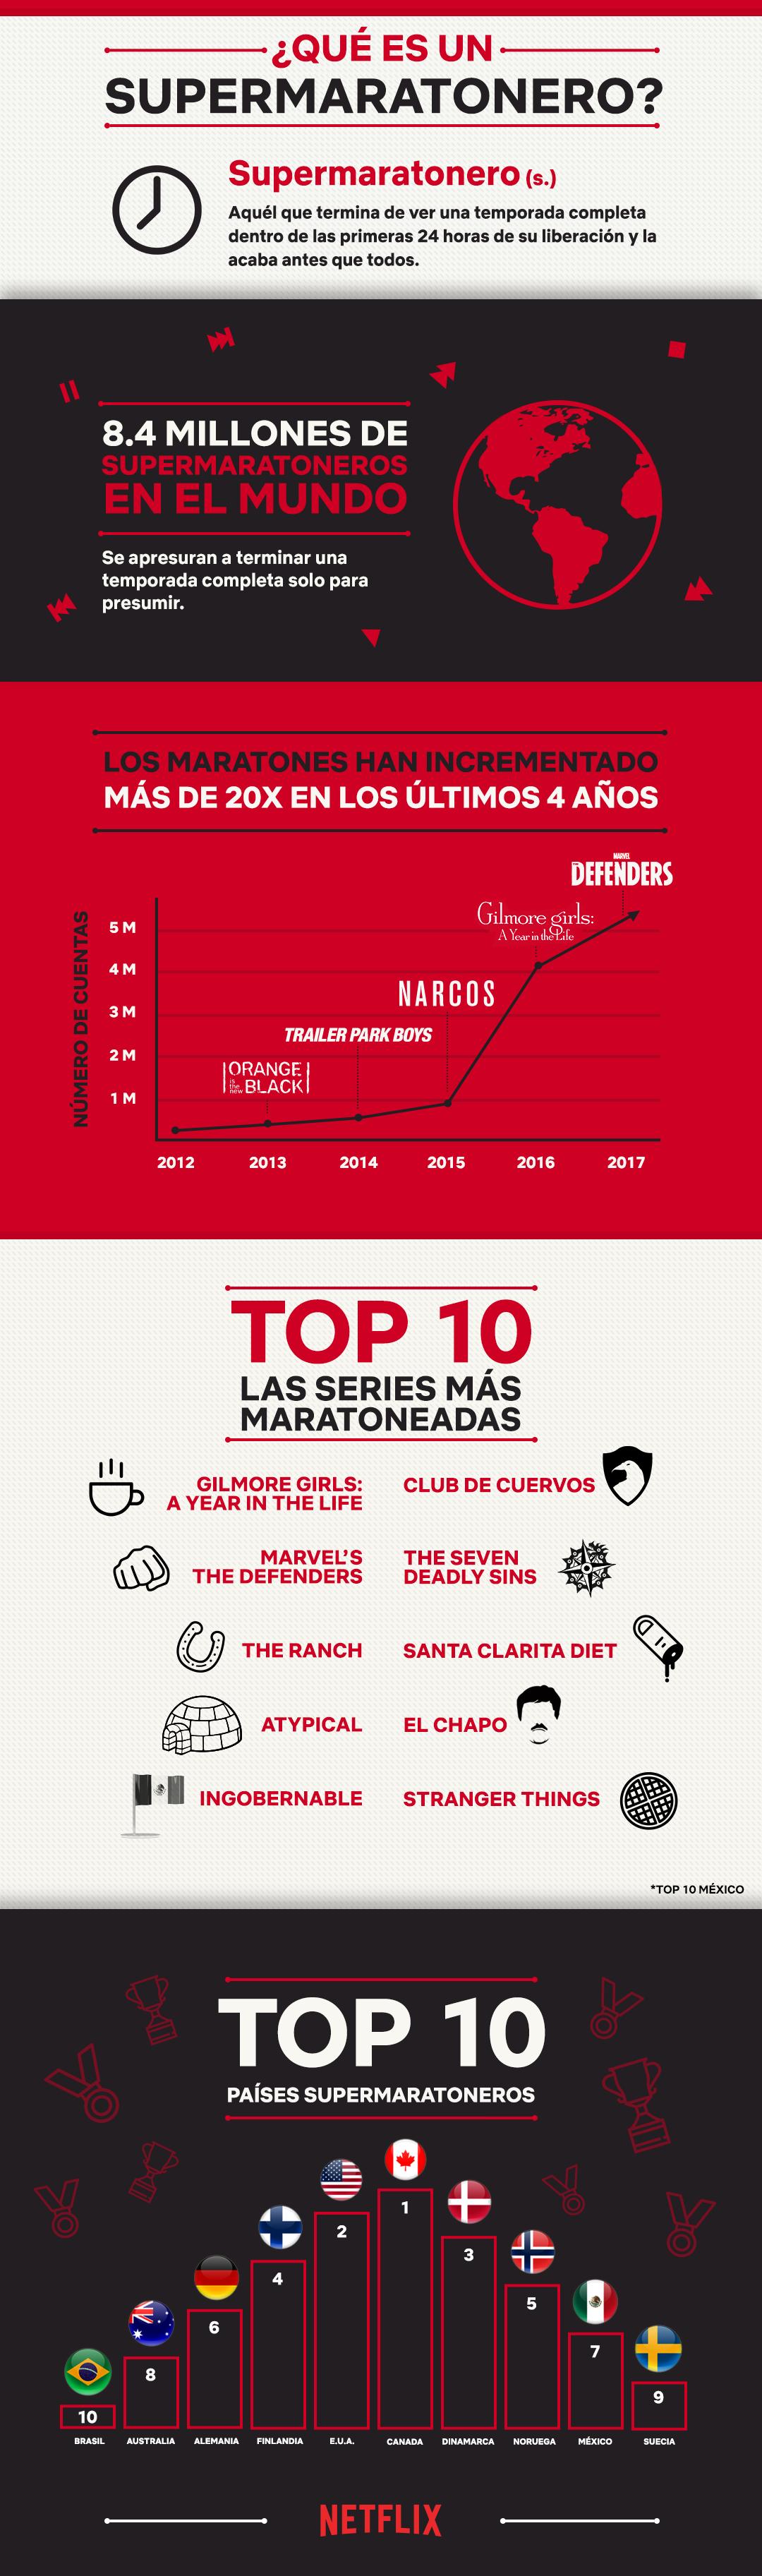 Infografia supermaratoneros de Netflix